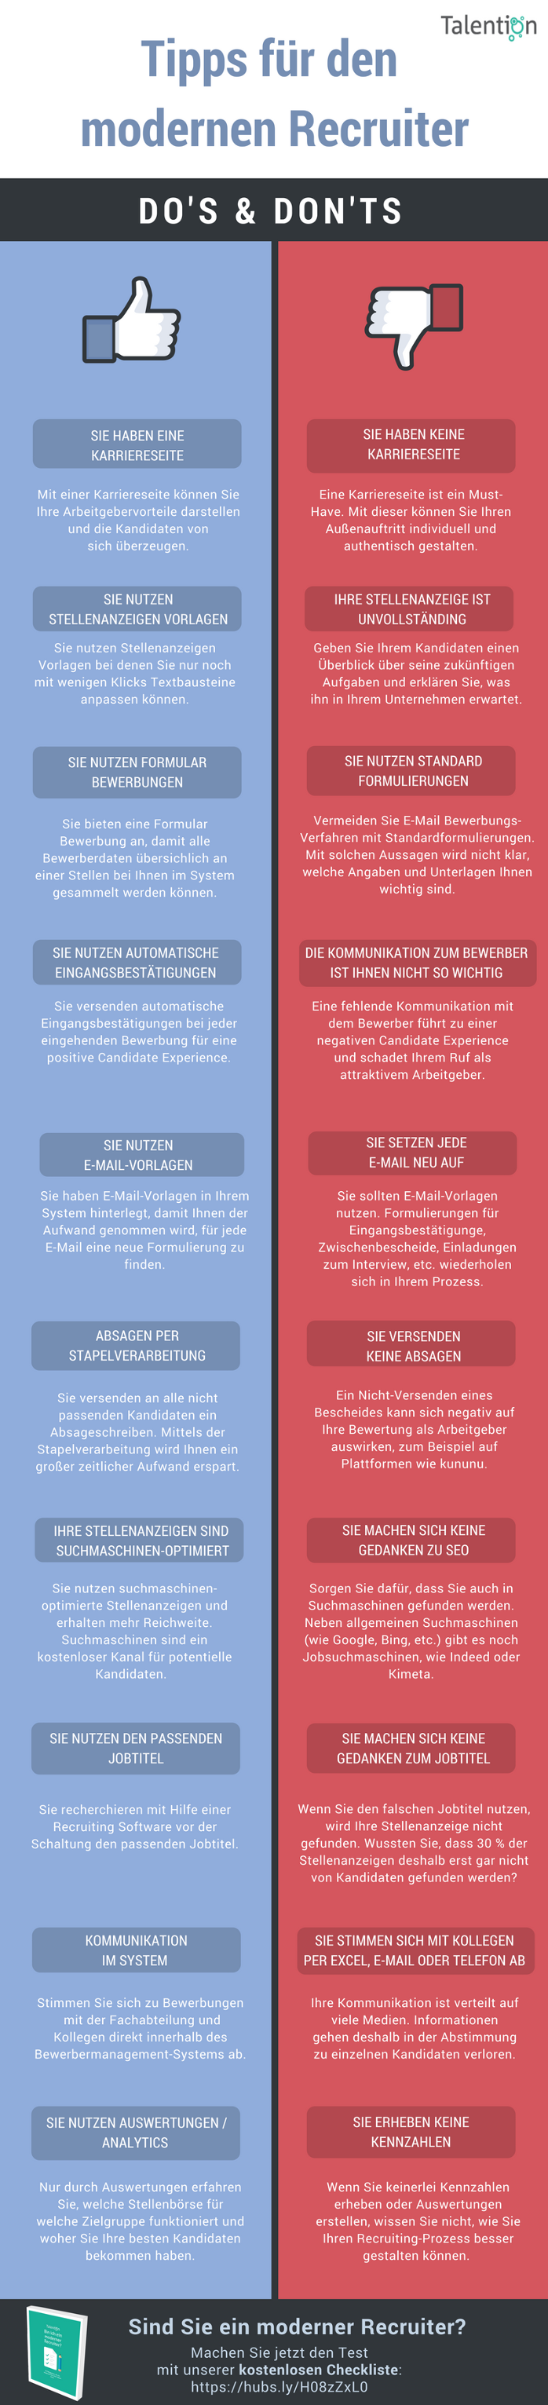 Infografik: Tipps für den modernen Recruiter